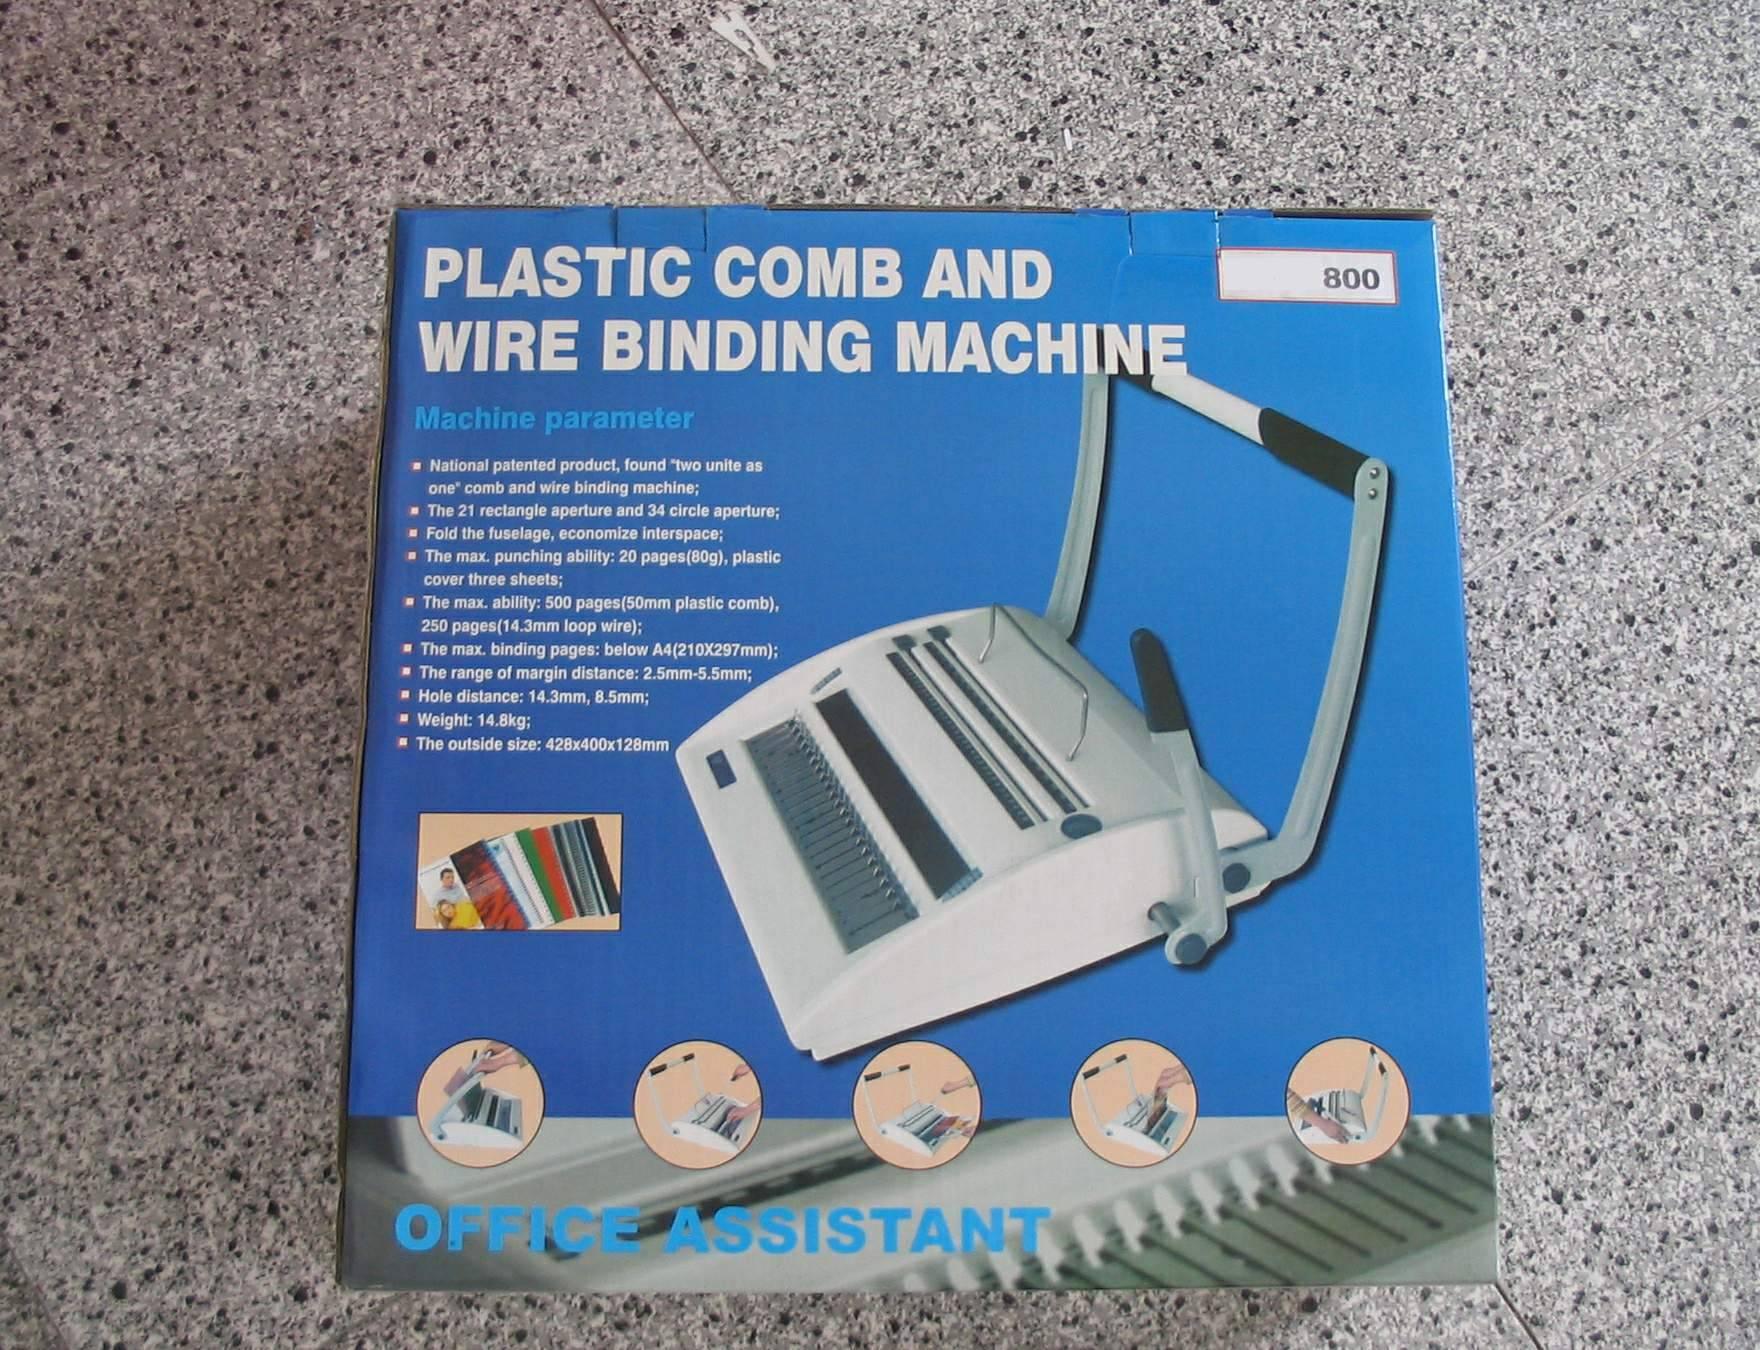 COMB/WIRE BINDING MACHINE ST800